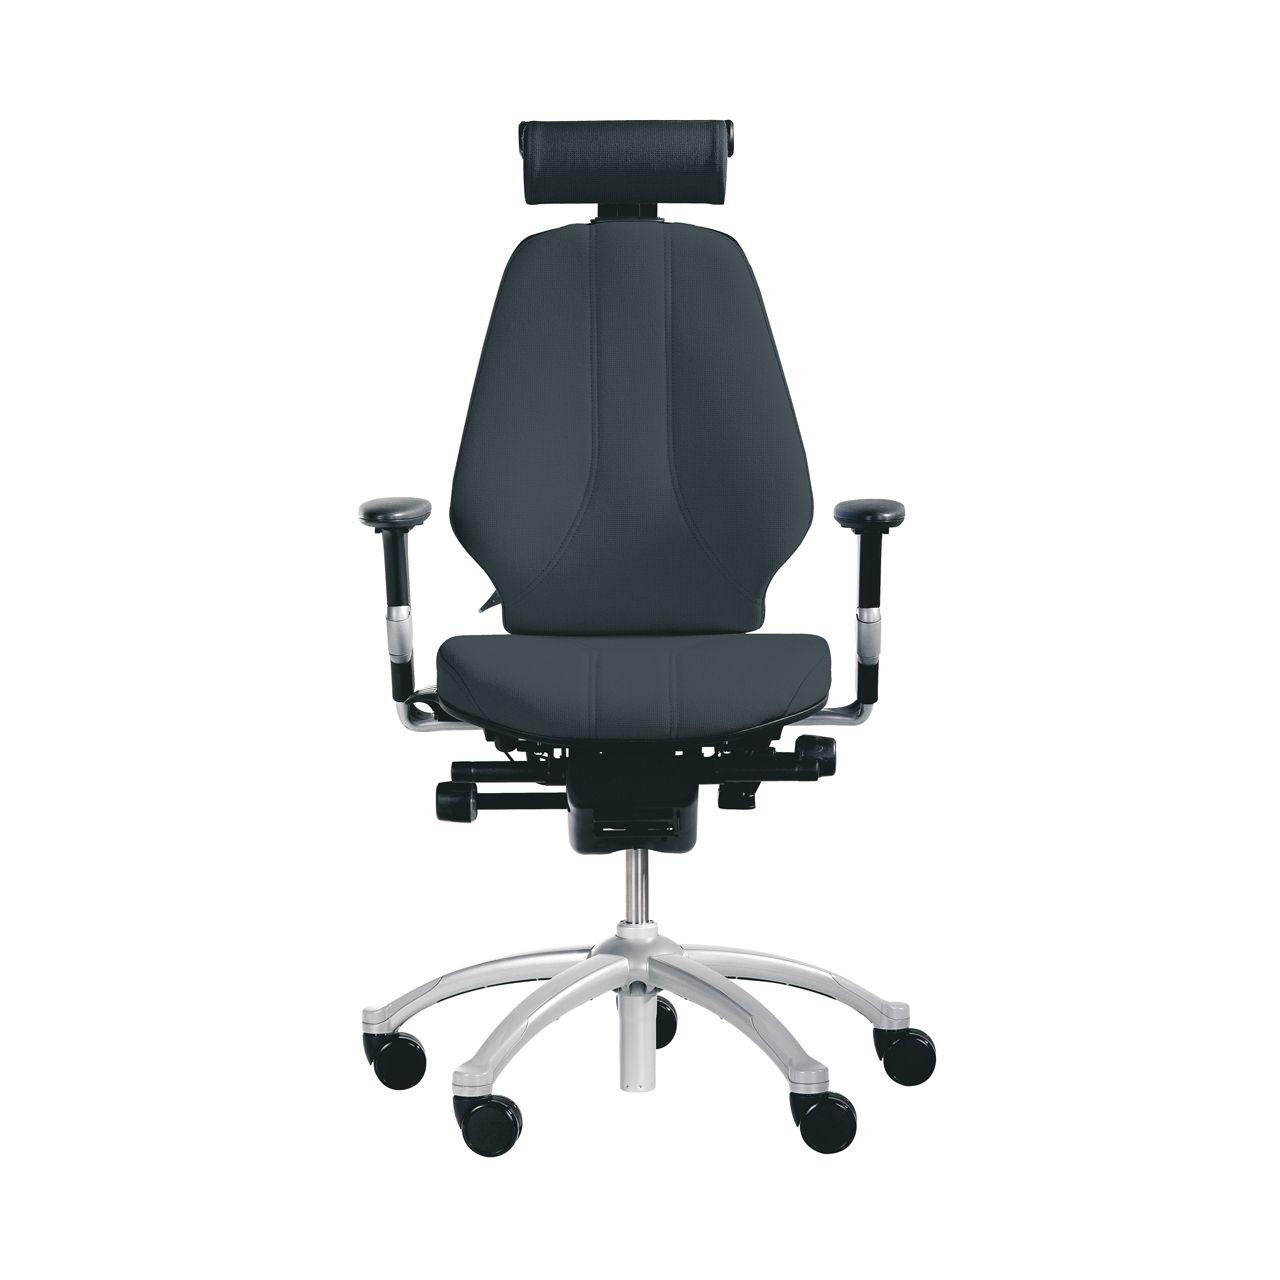 rh logic 300 xl bureaustoel STKALOG303 zwart met neksteun